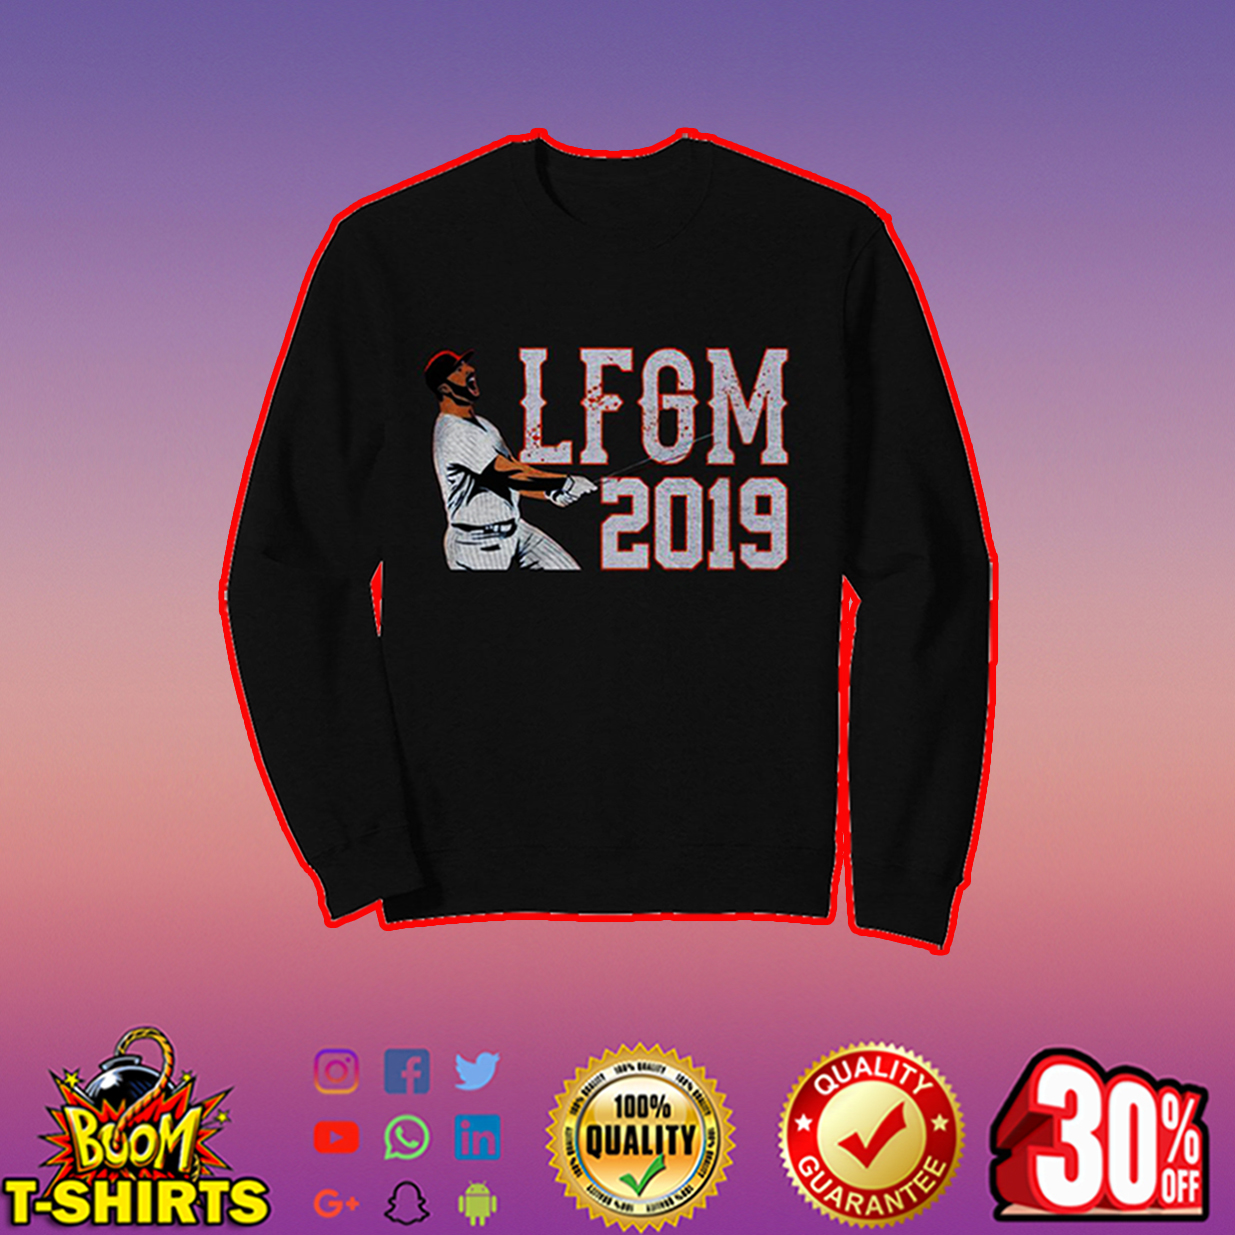 Pete Alonso LFGM 2019 sweatshirt